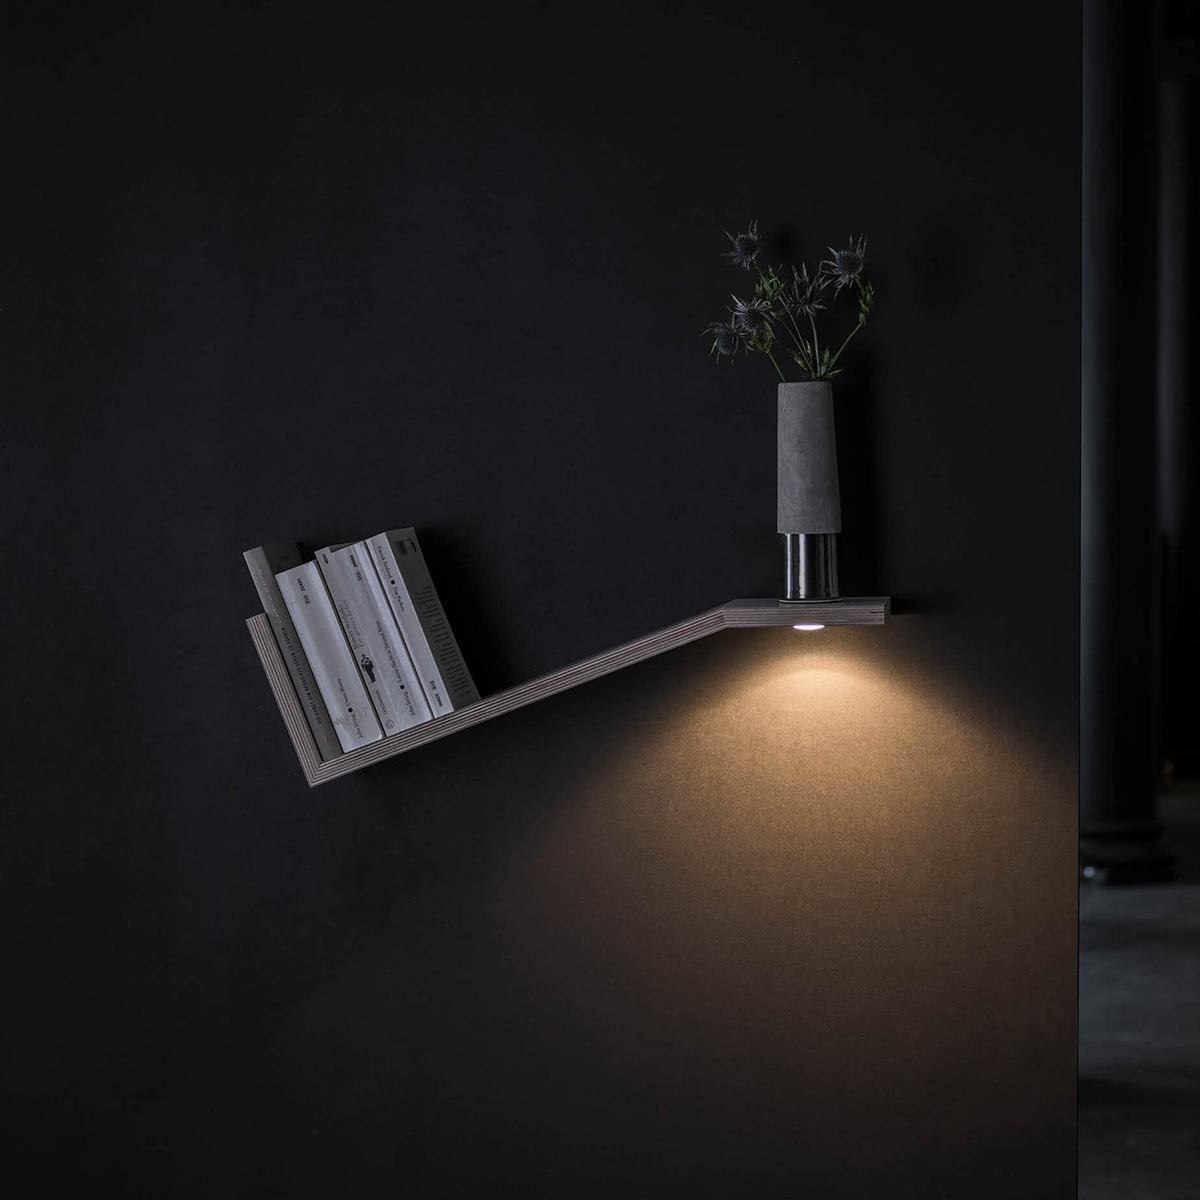 less 'n' more Kippling Bücherregal mit Mimix LED Einbaustrahler KI-M